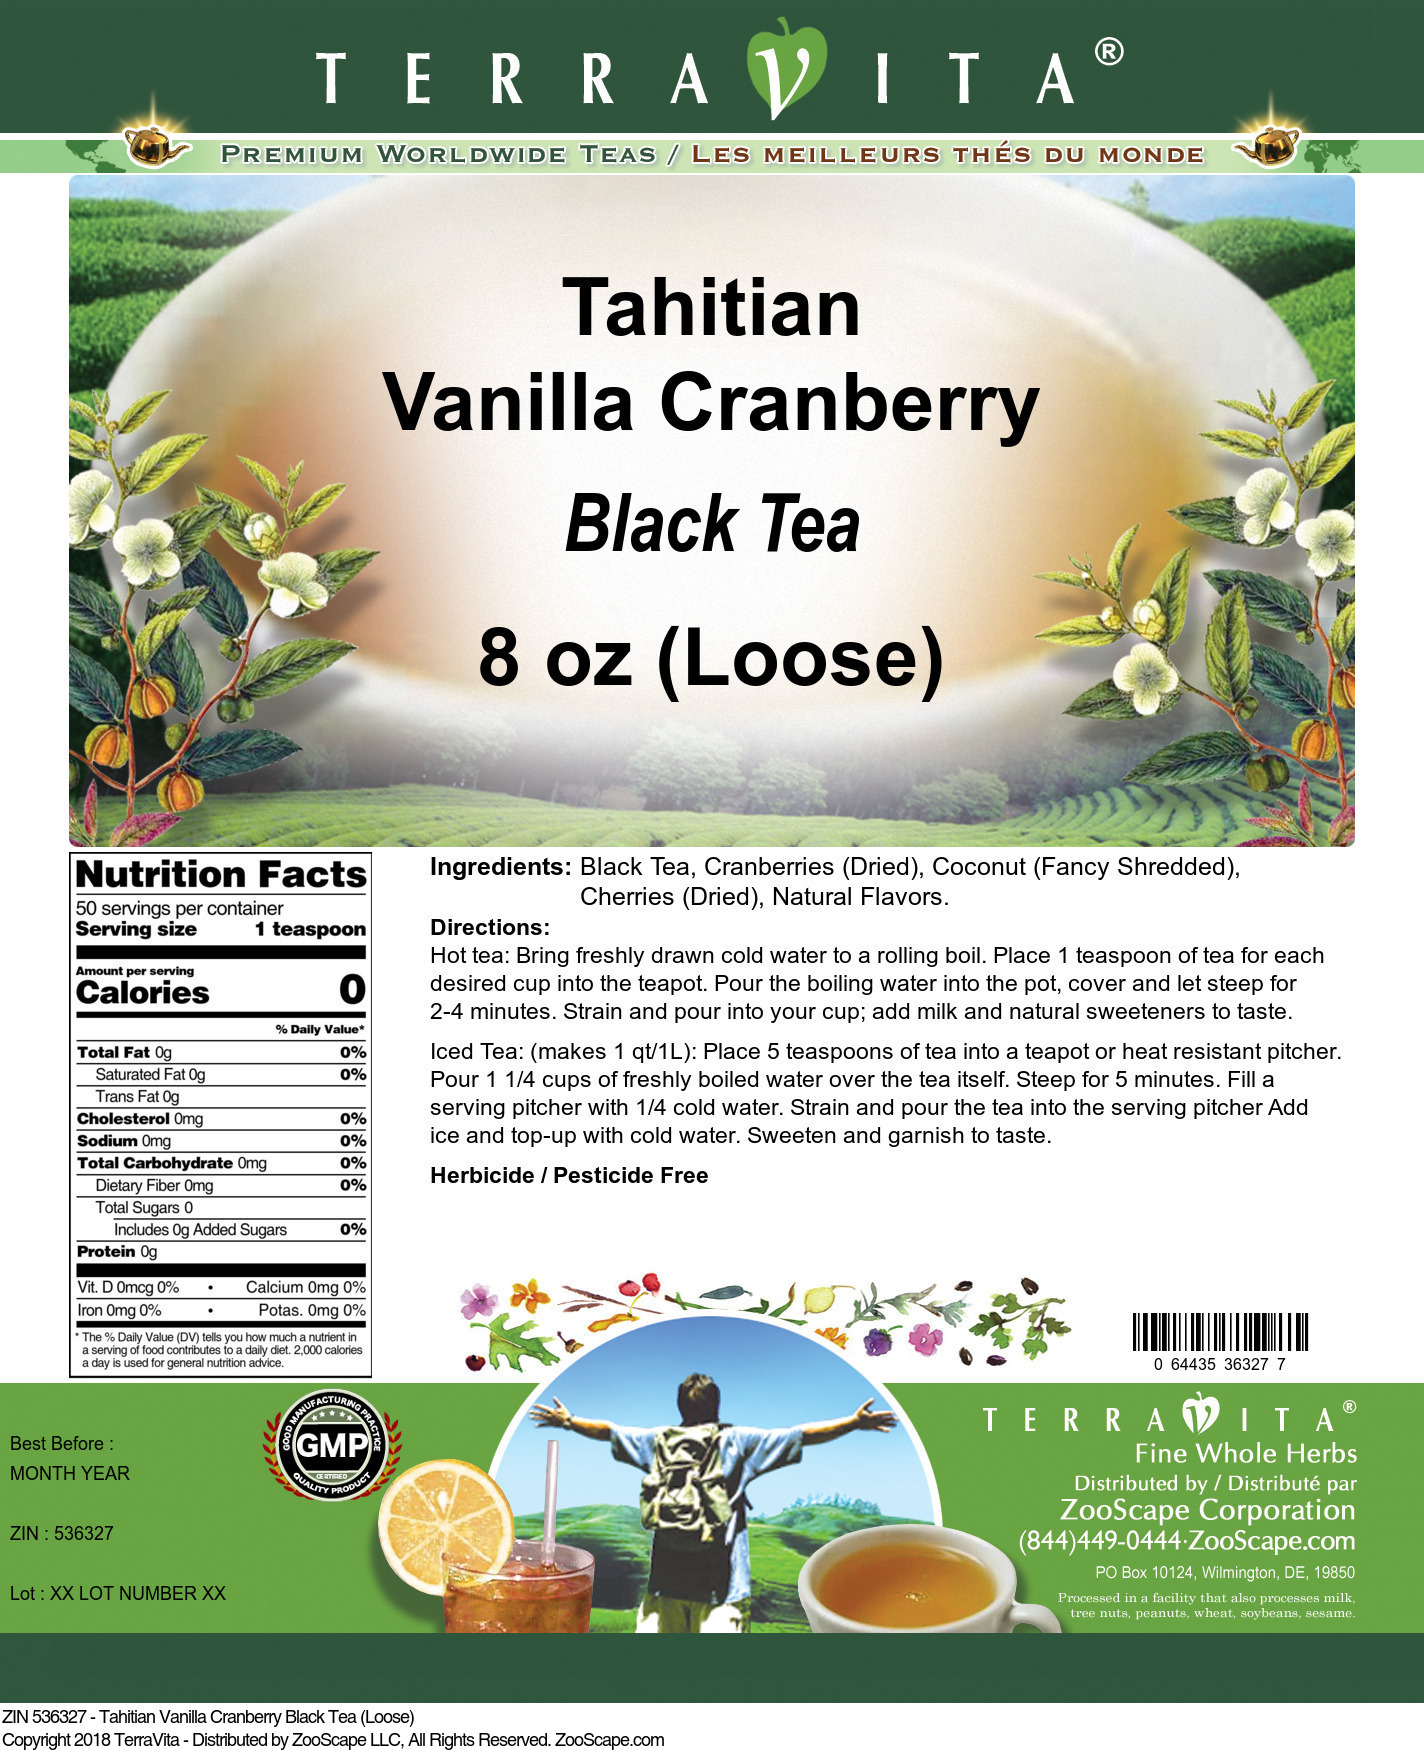 Tahitian Vanilla Cranberry Black Tea (Loose)